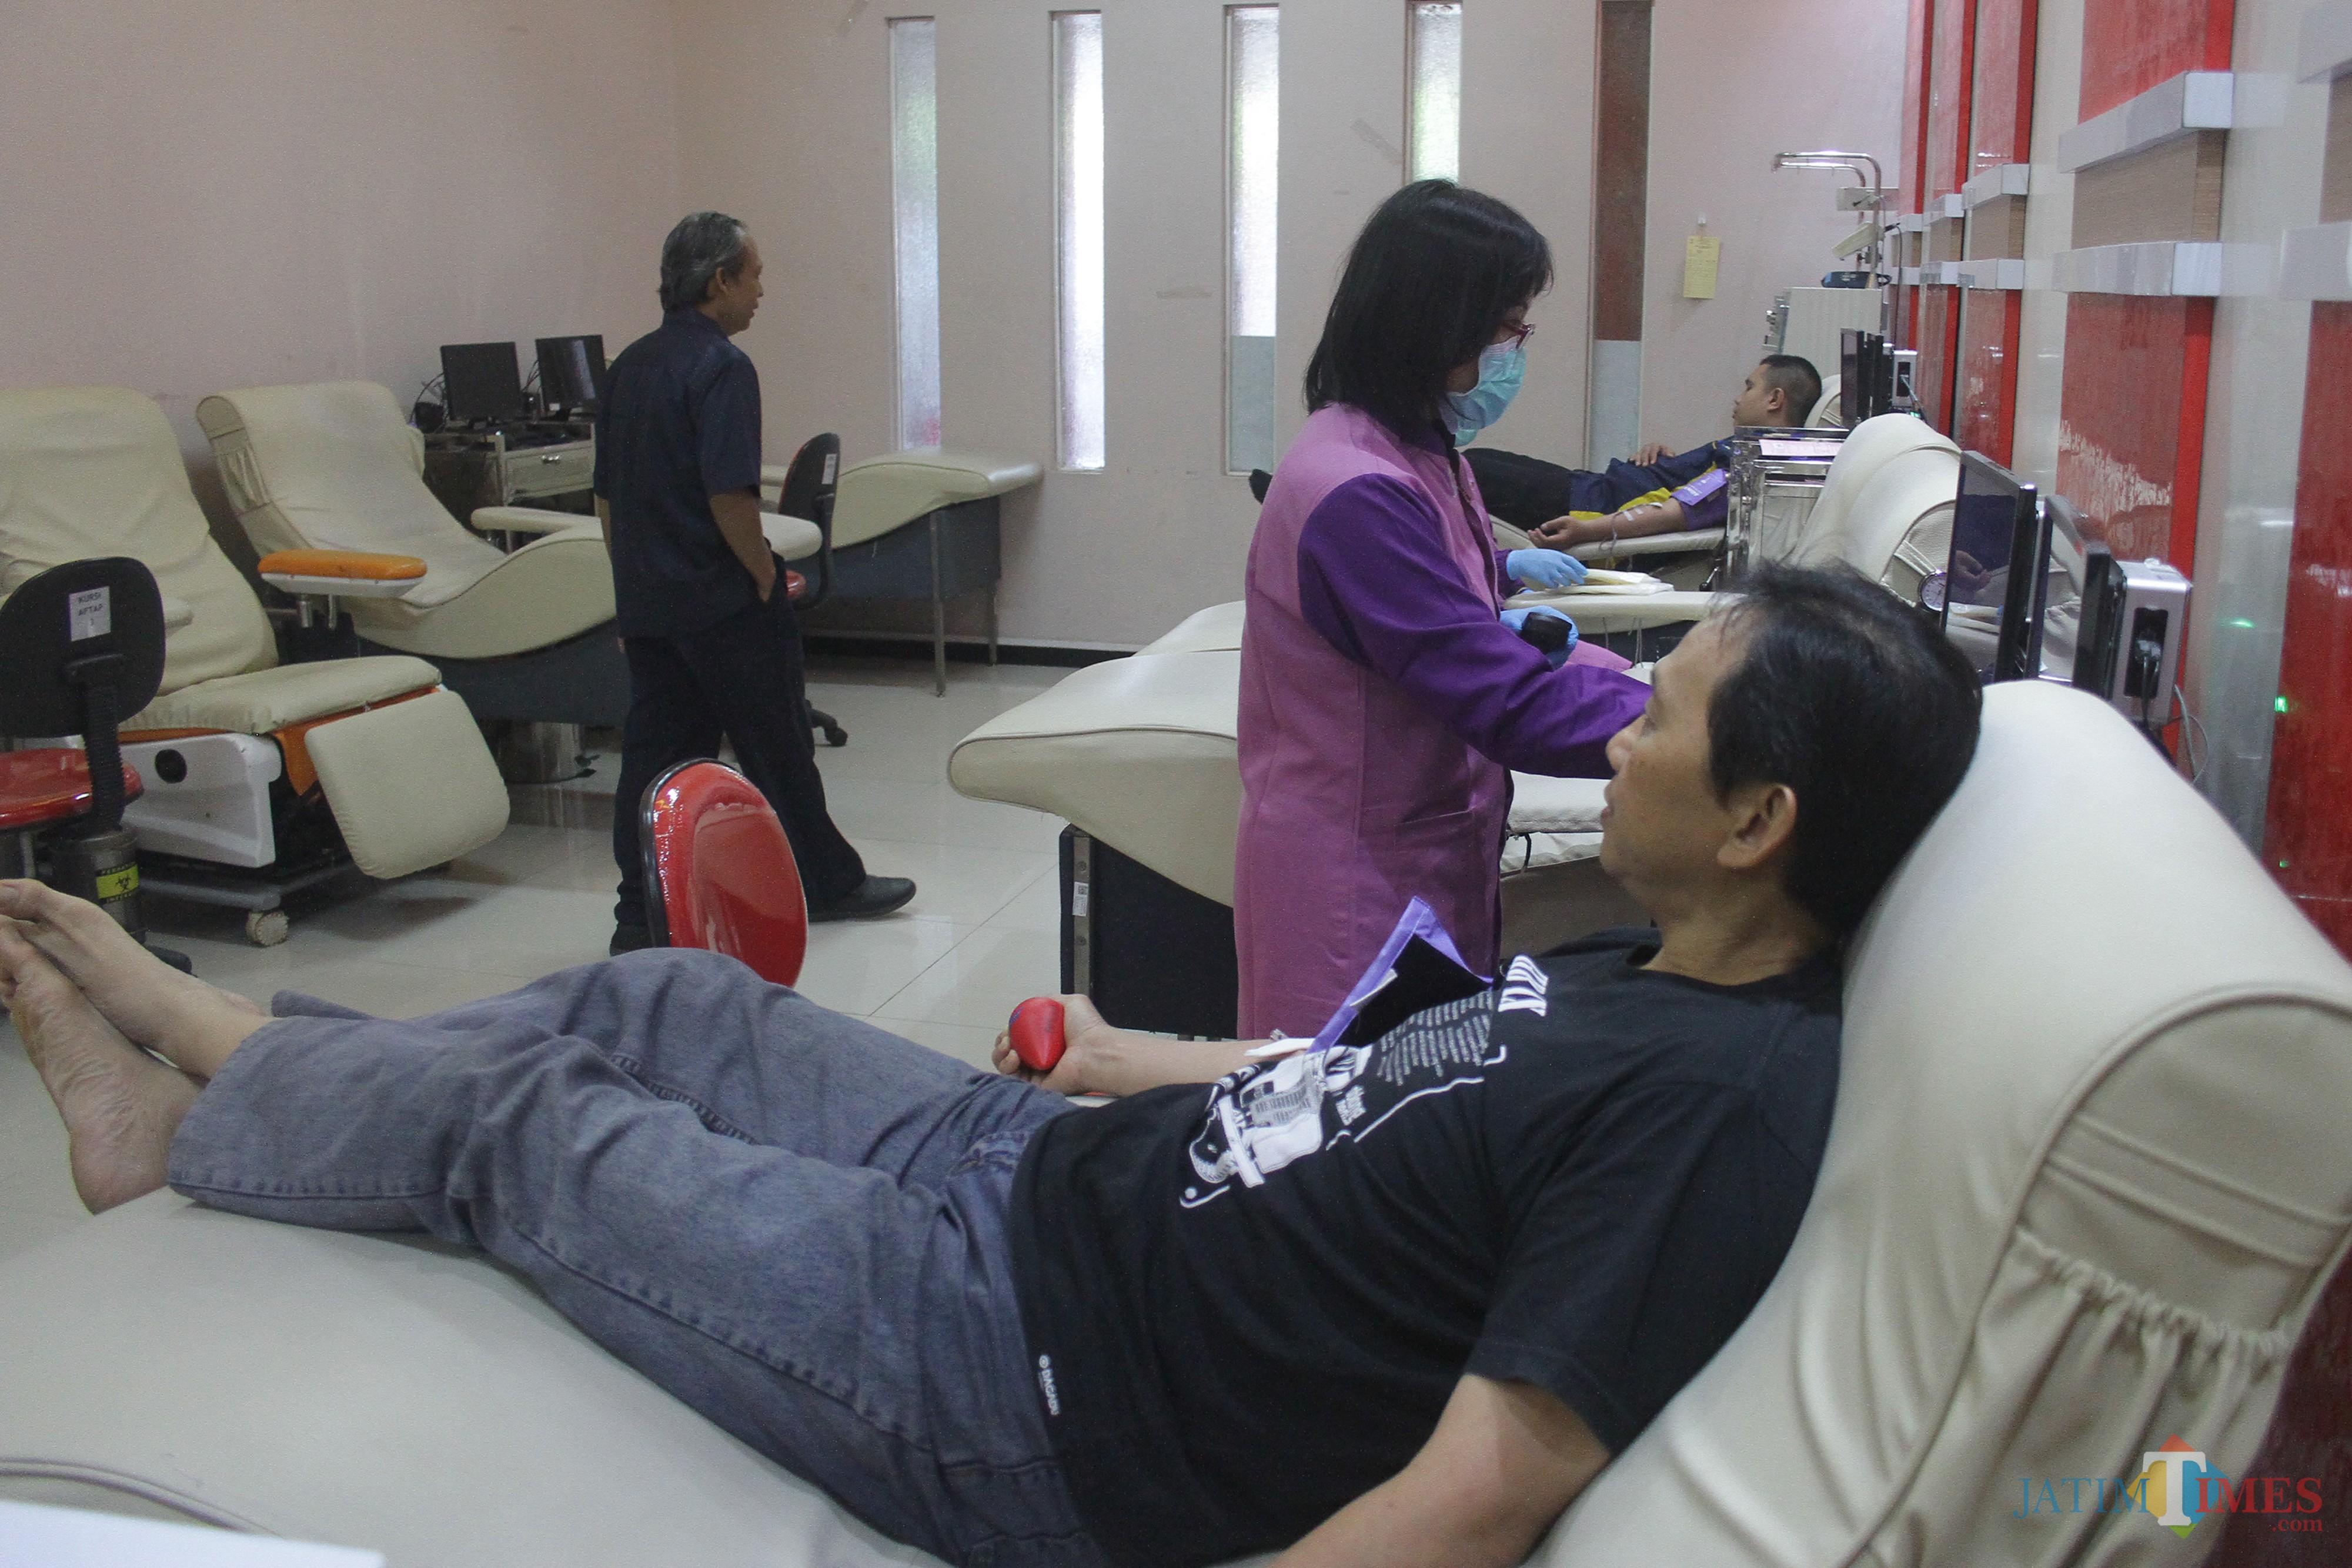 Sejumlah pendonor tengah melakukan pengambilan darah di UTD PMI Kota Malang. (Foto: Nurlayla Ratri/MalangTIMES)